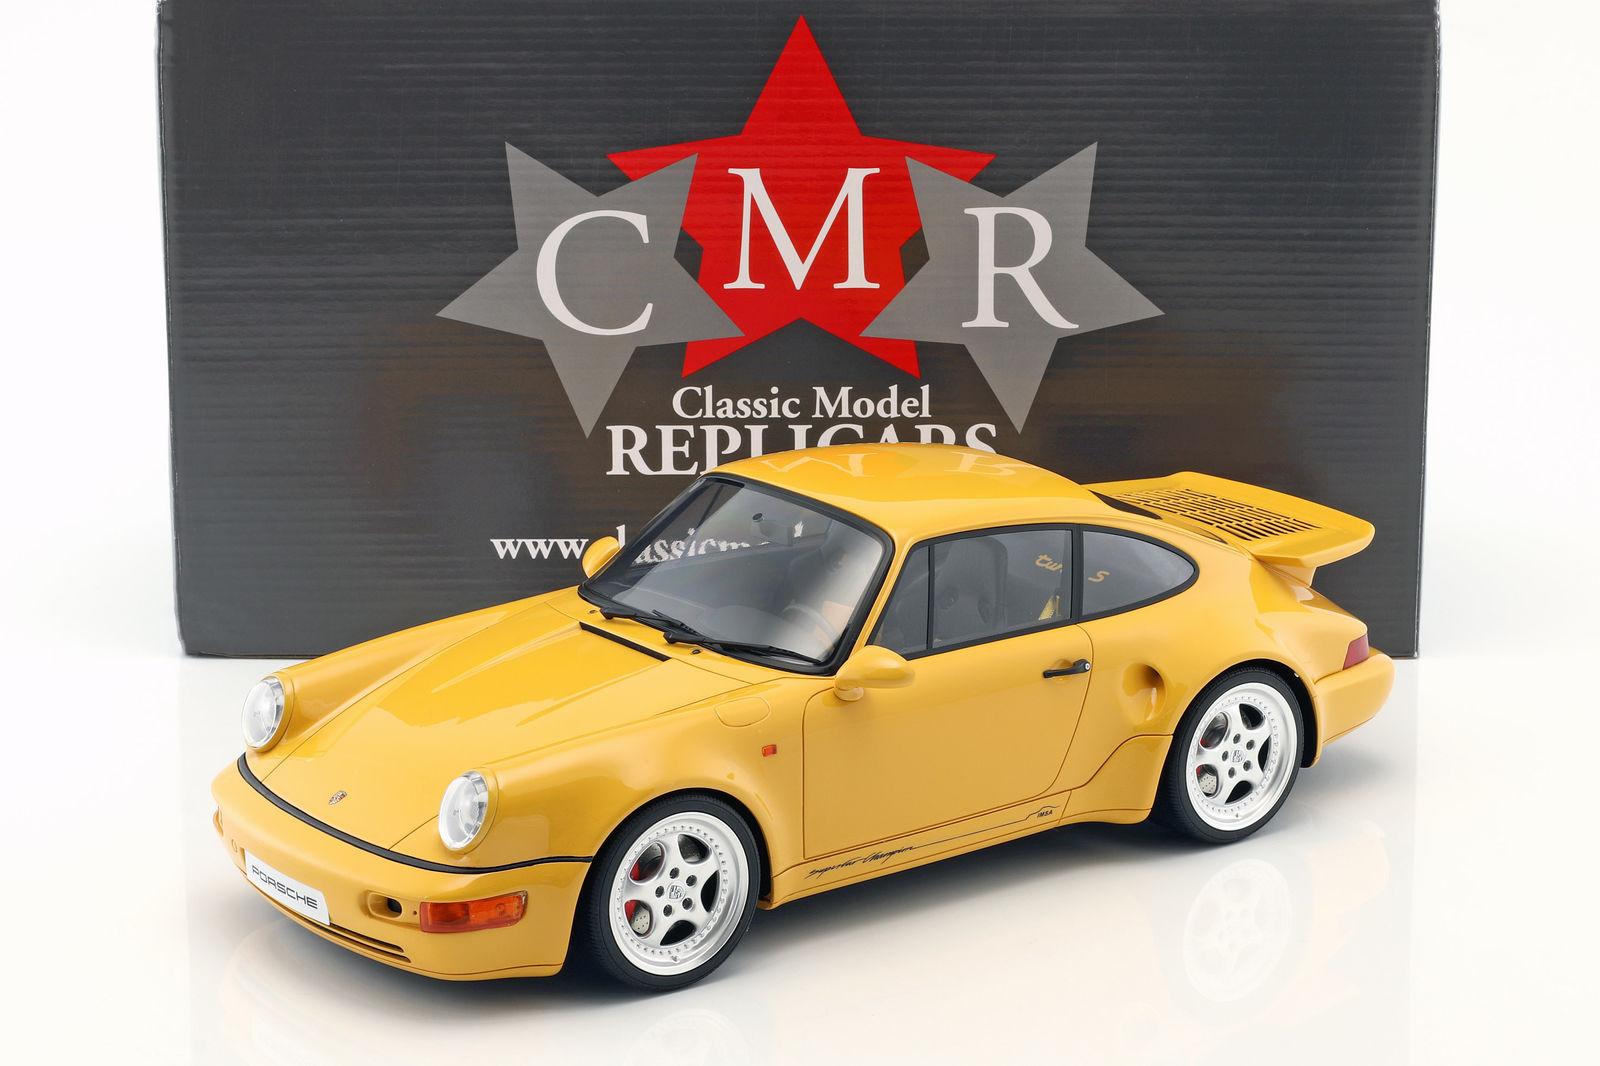 CMR 1/12 ポルシェ 911 (964) ターボS ライトウェイト スピードイエロー Porsche 911 (964) Turbo S lightweight speed yellow